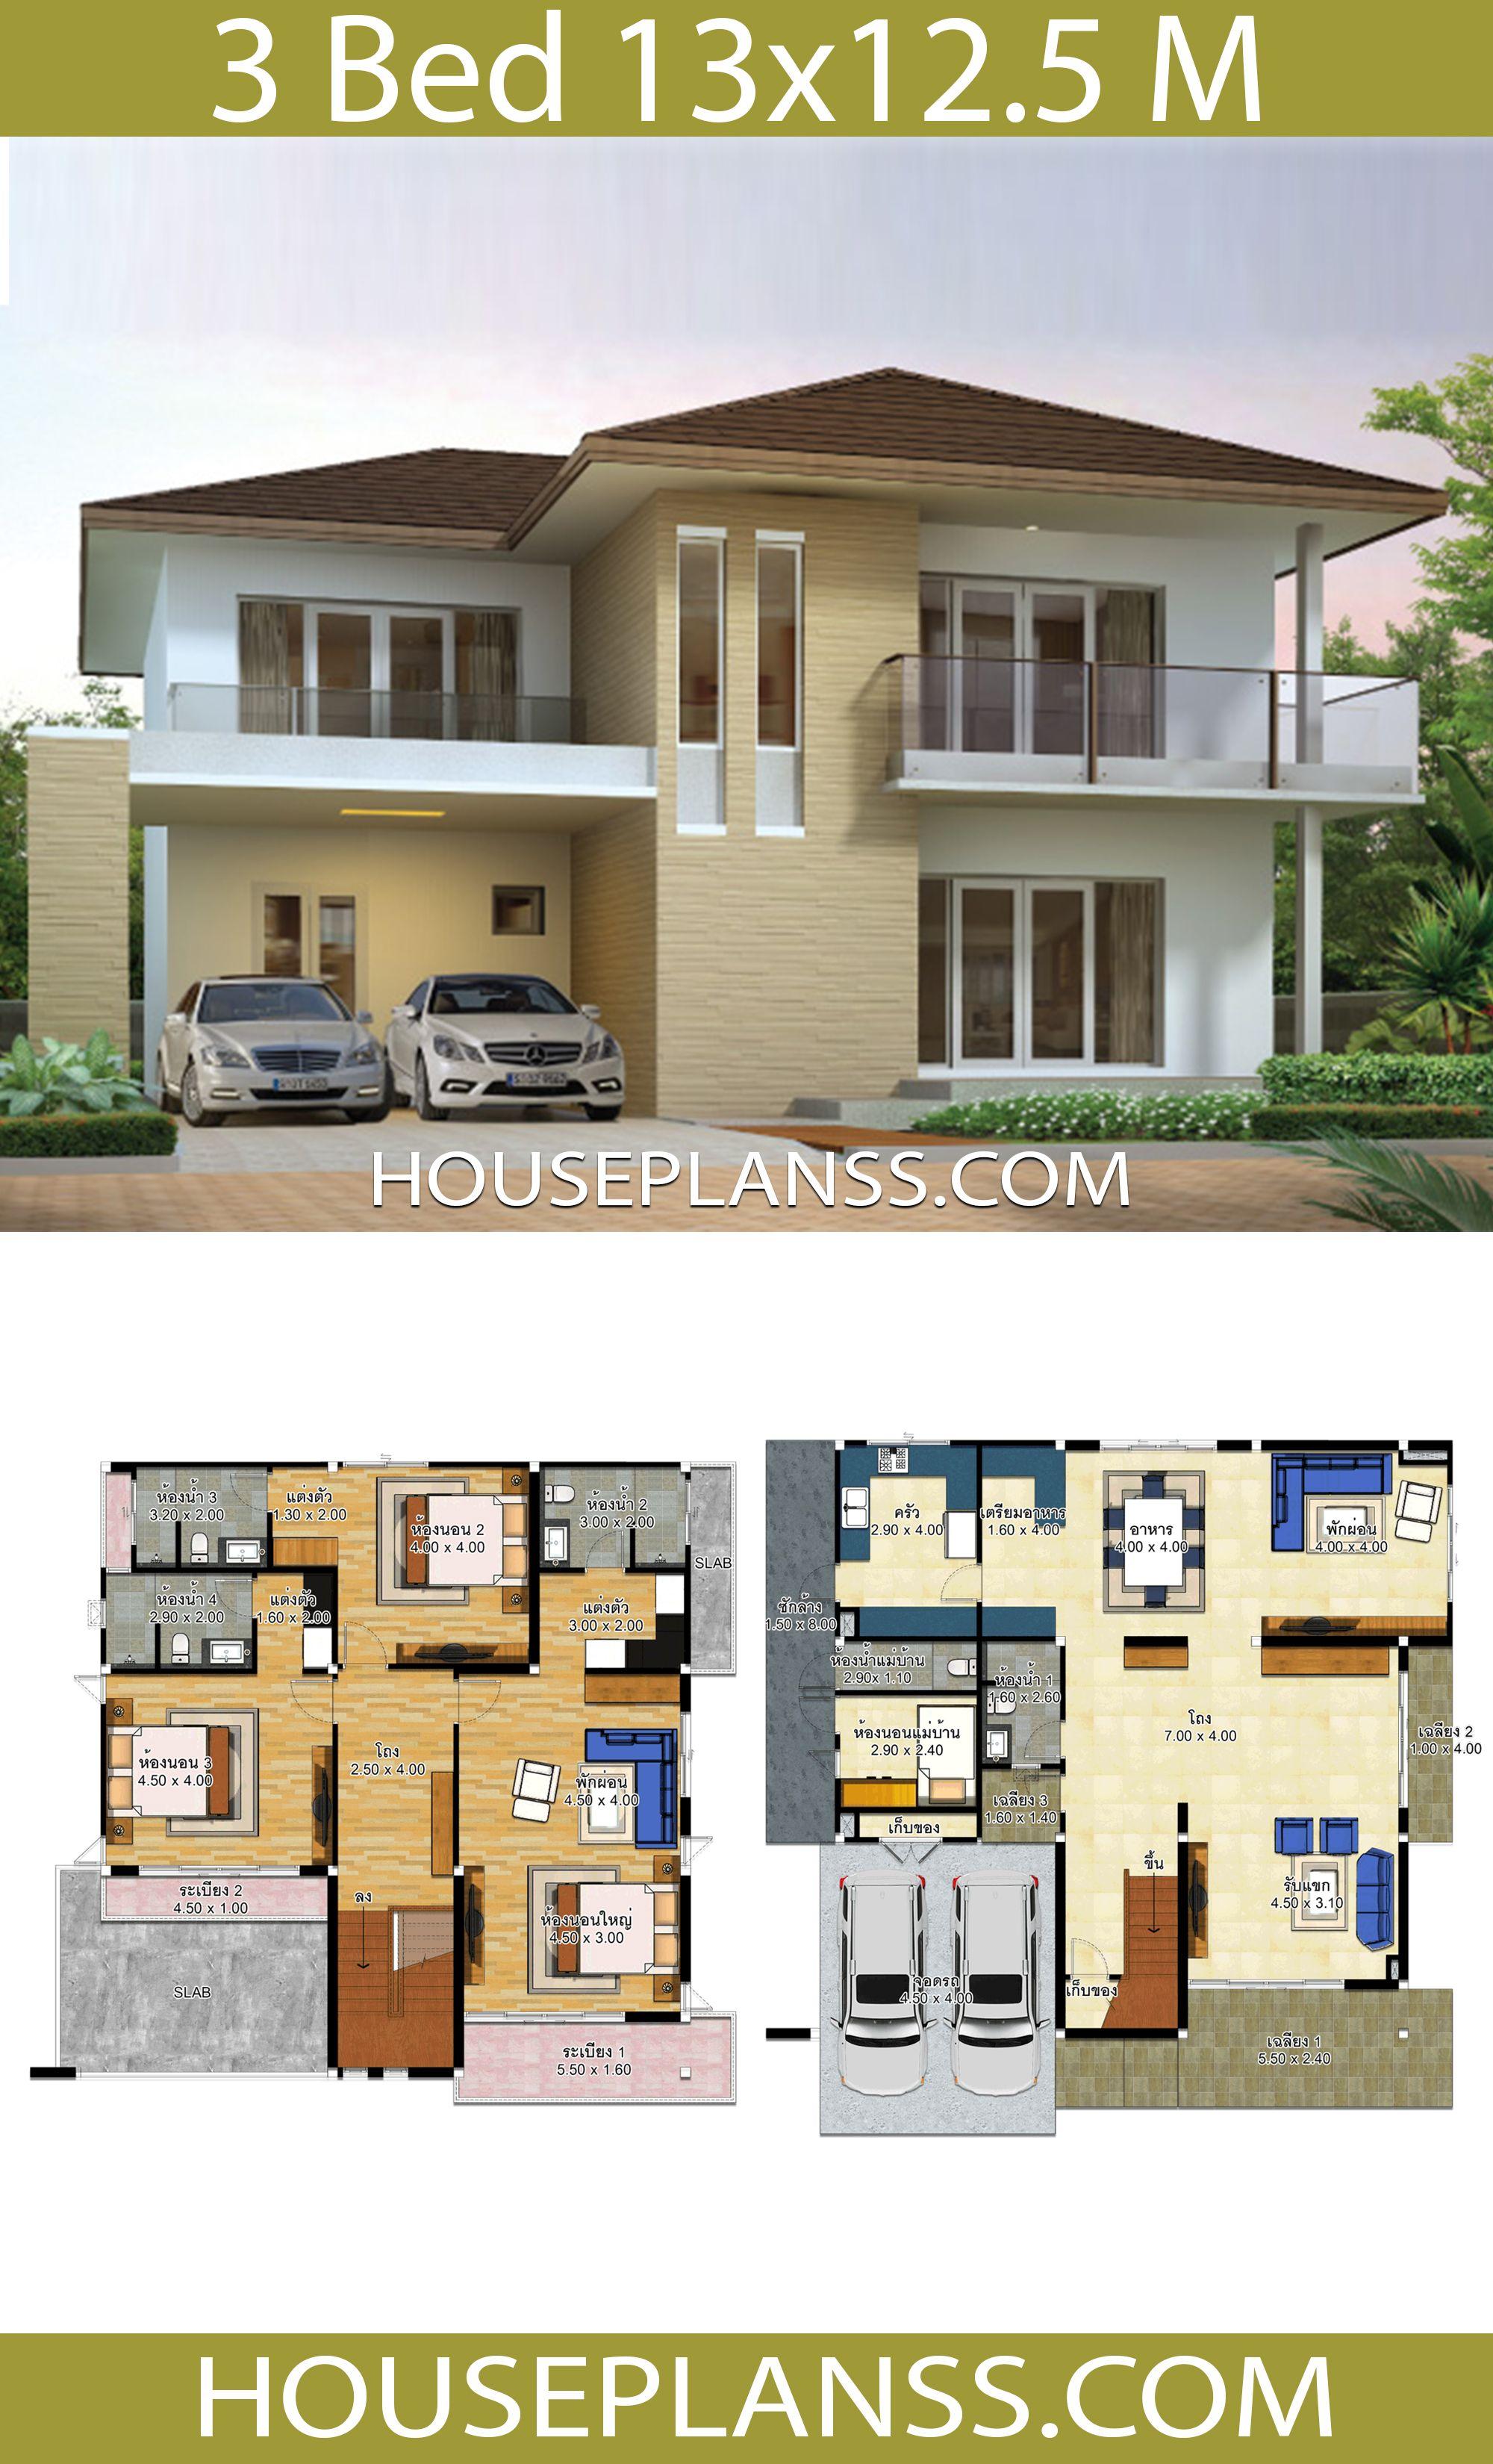 House Design Idea 13x12 5 With 3 Bedrooms House Plans 3d Beautiful House Plans Modern Bungalow House House Design